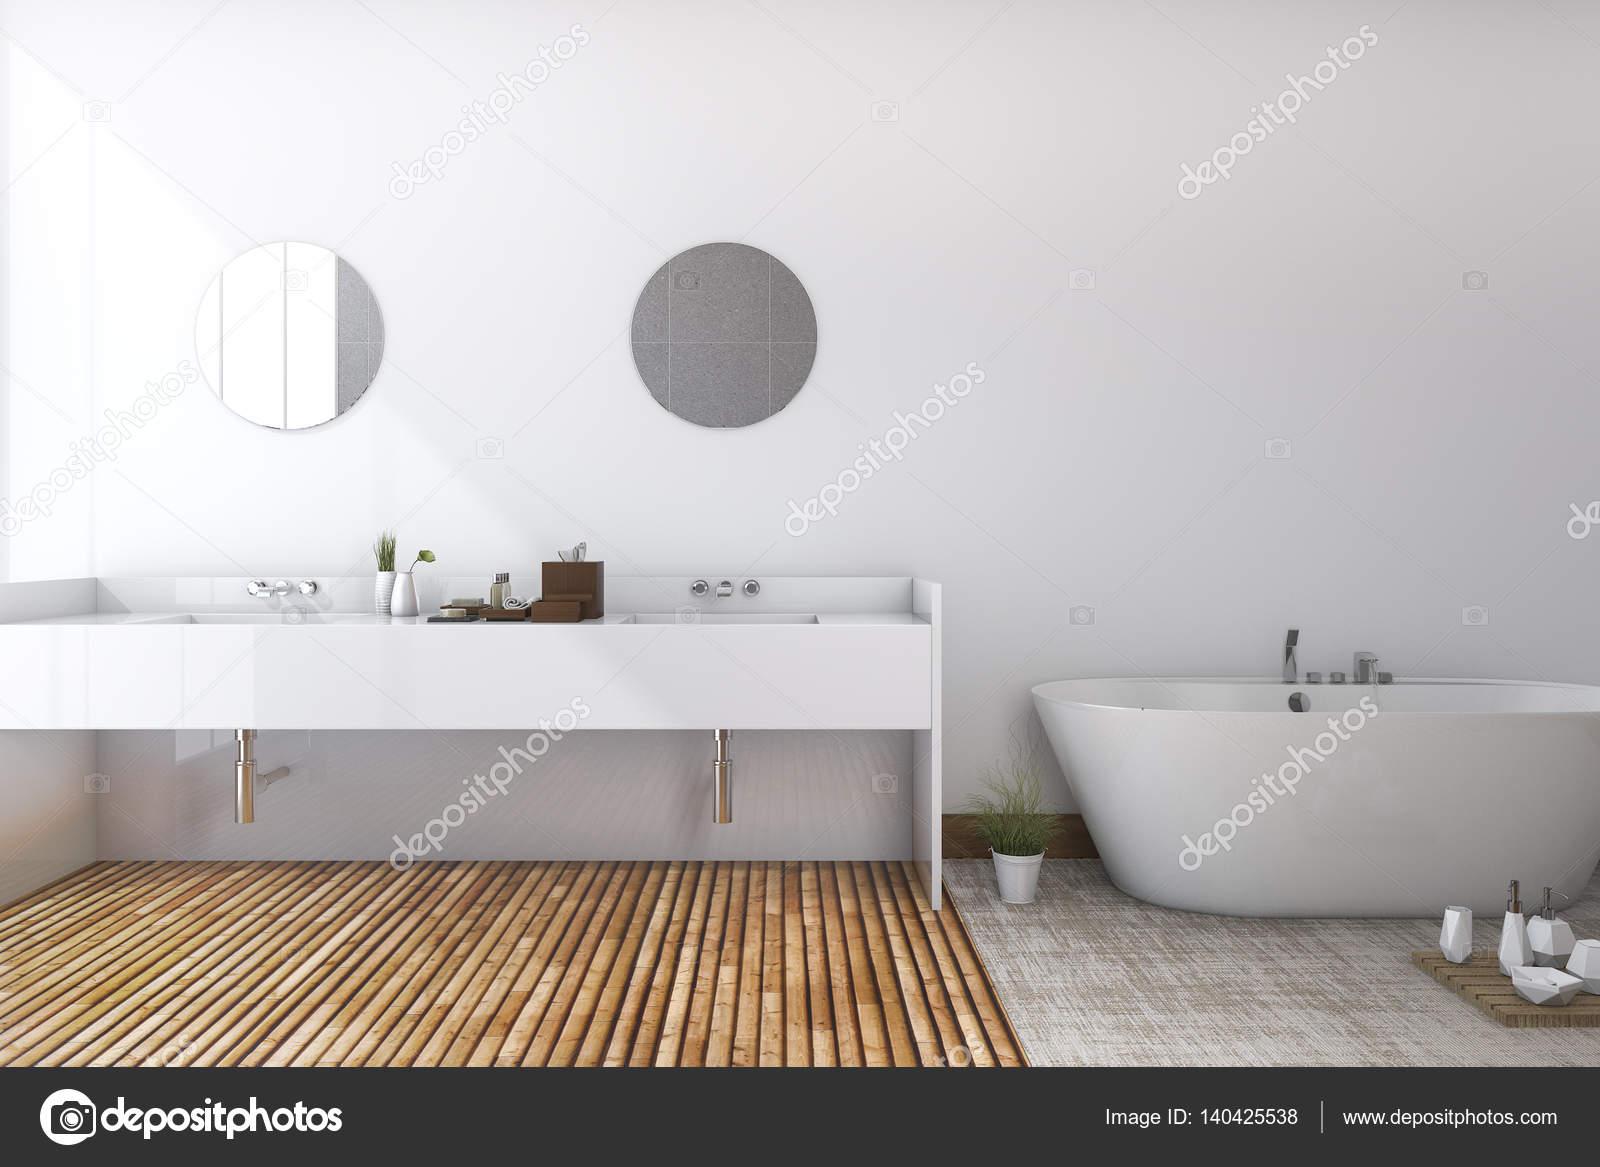 3d rendering witte minimale toilet en badkamer met houten vloer